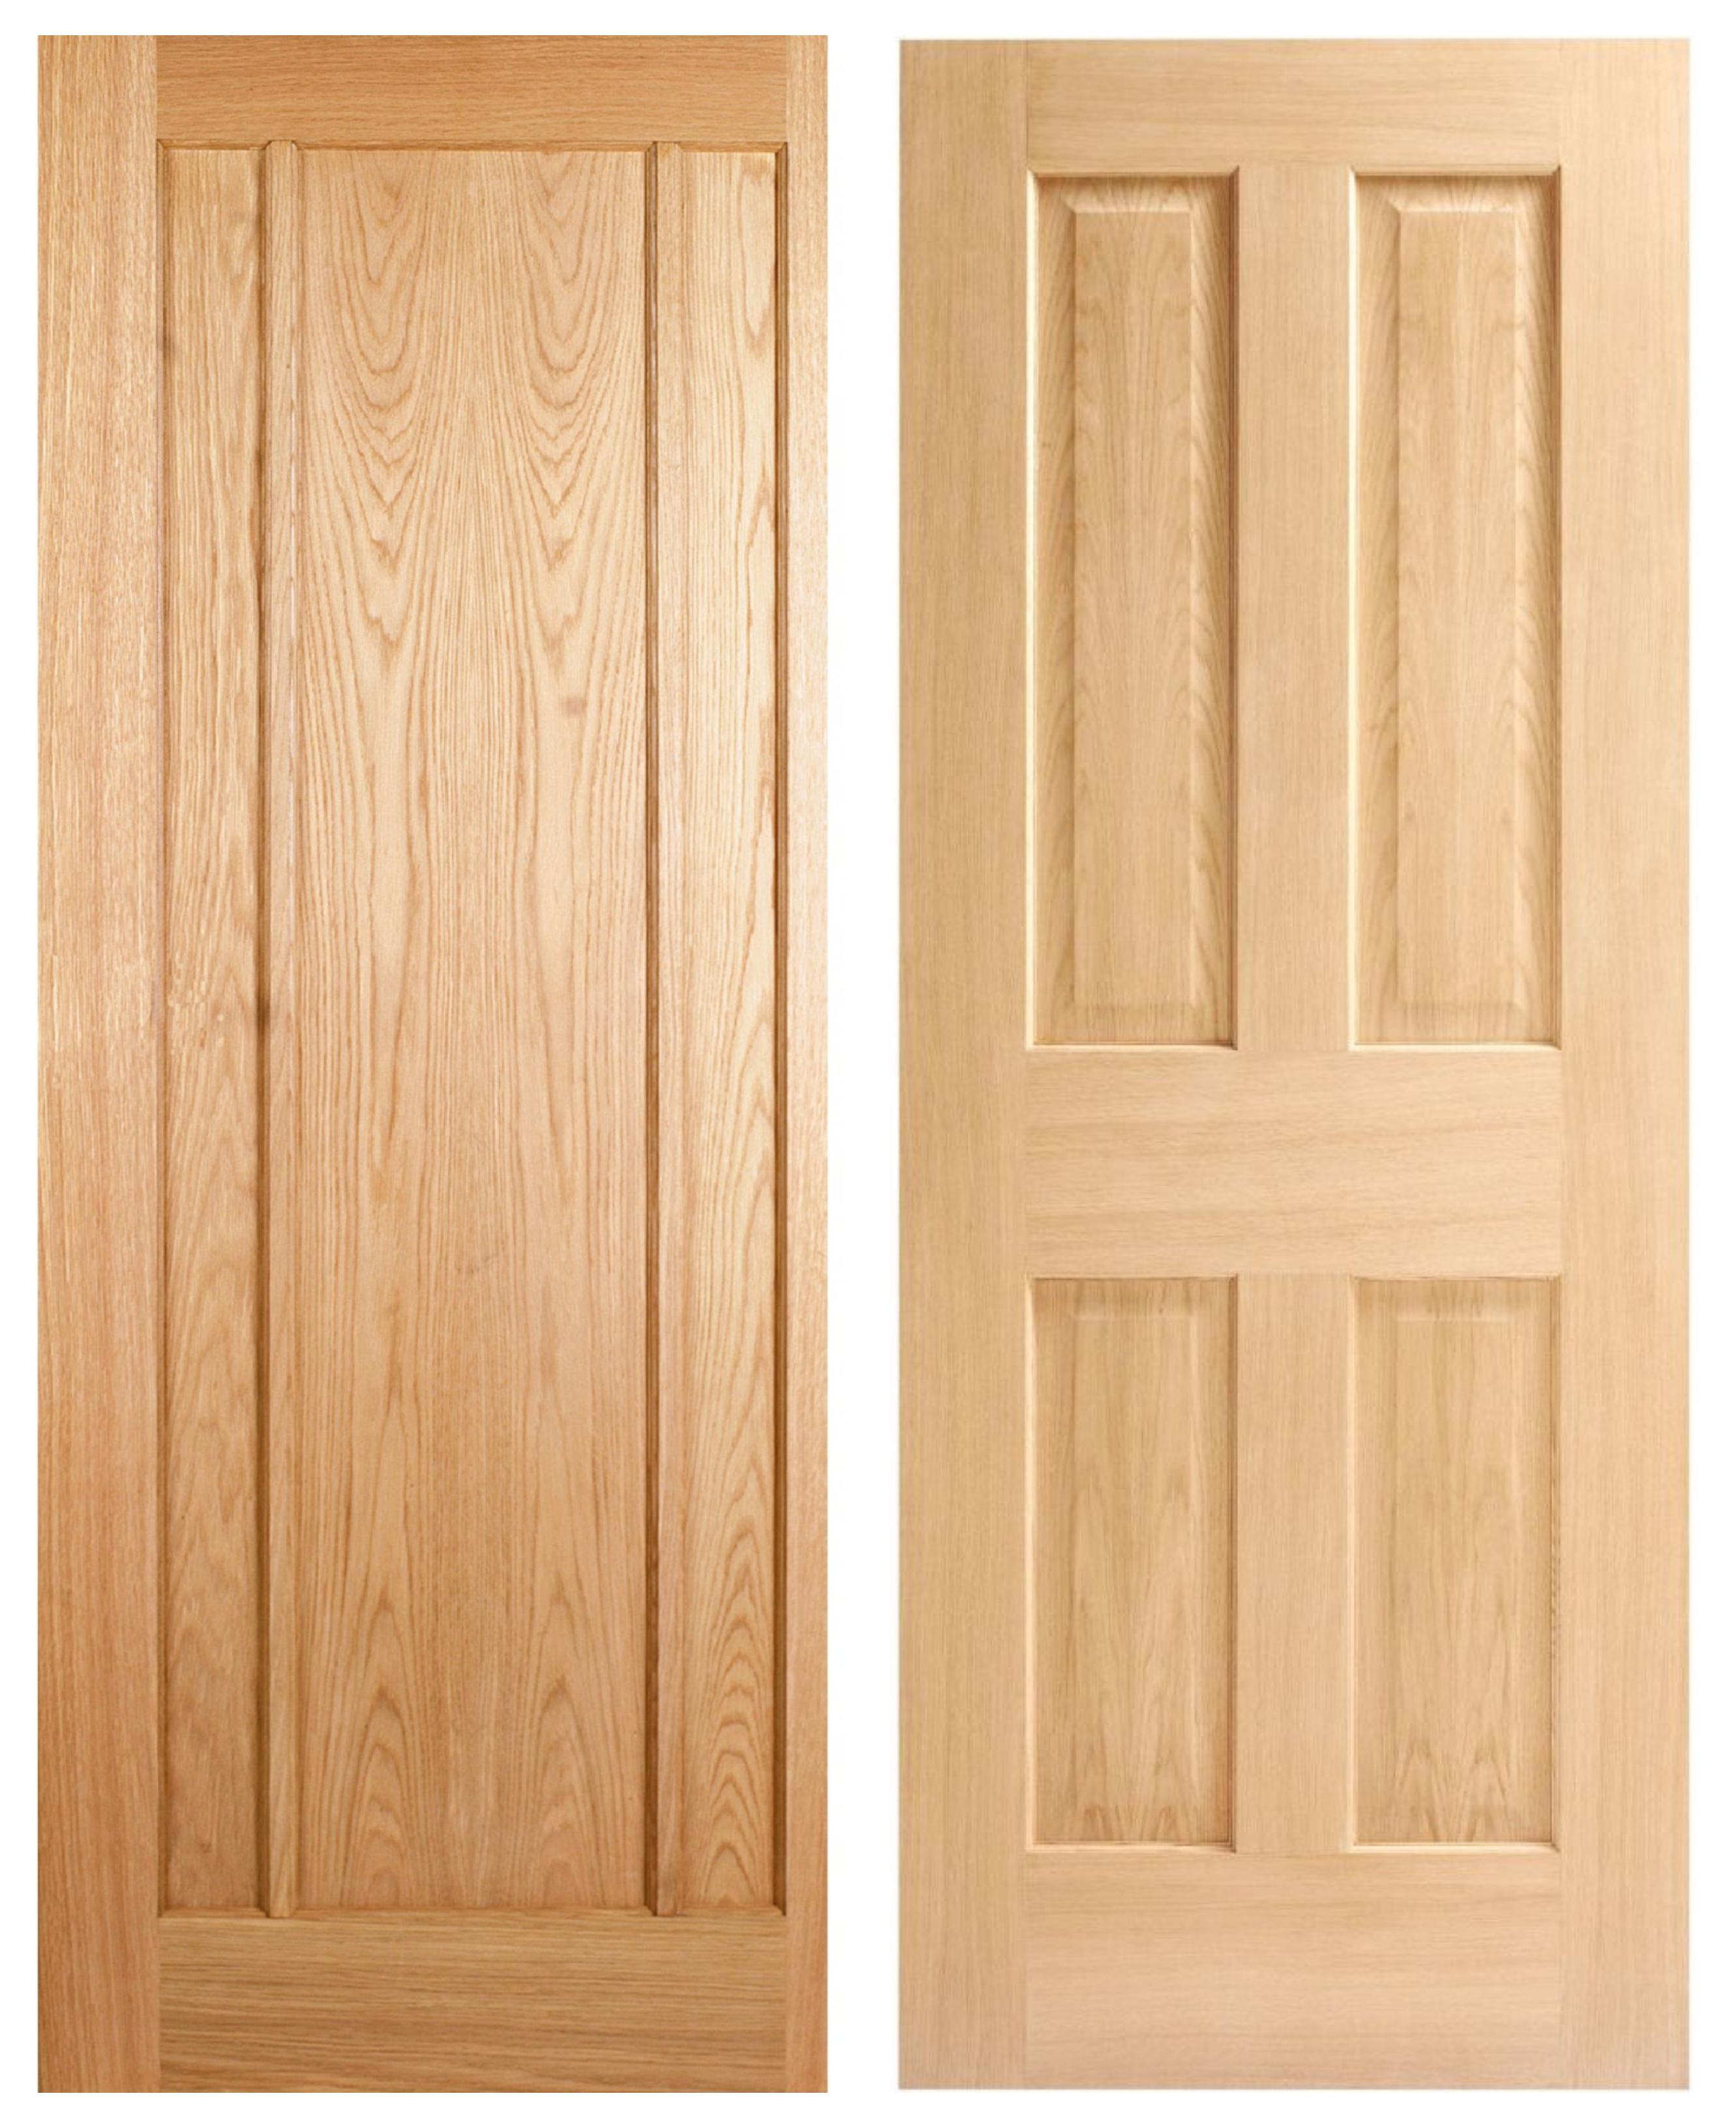 Wickes York Oak Veneer 3 Panel Internal Door or Cobham Oak 4 Panel Internal Door (1981mm X 686mm) for £25 (free click & collect) @ Wickes